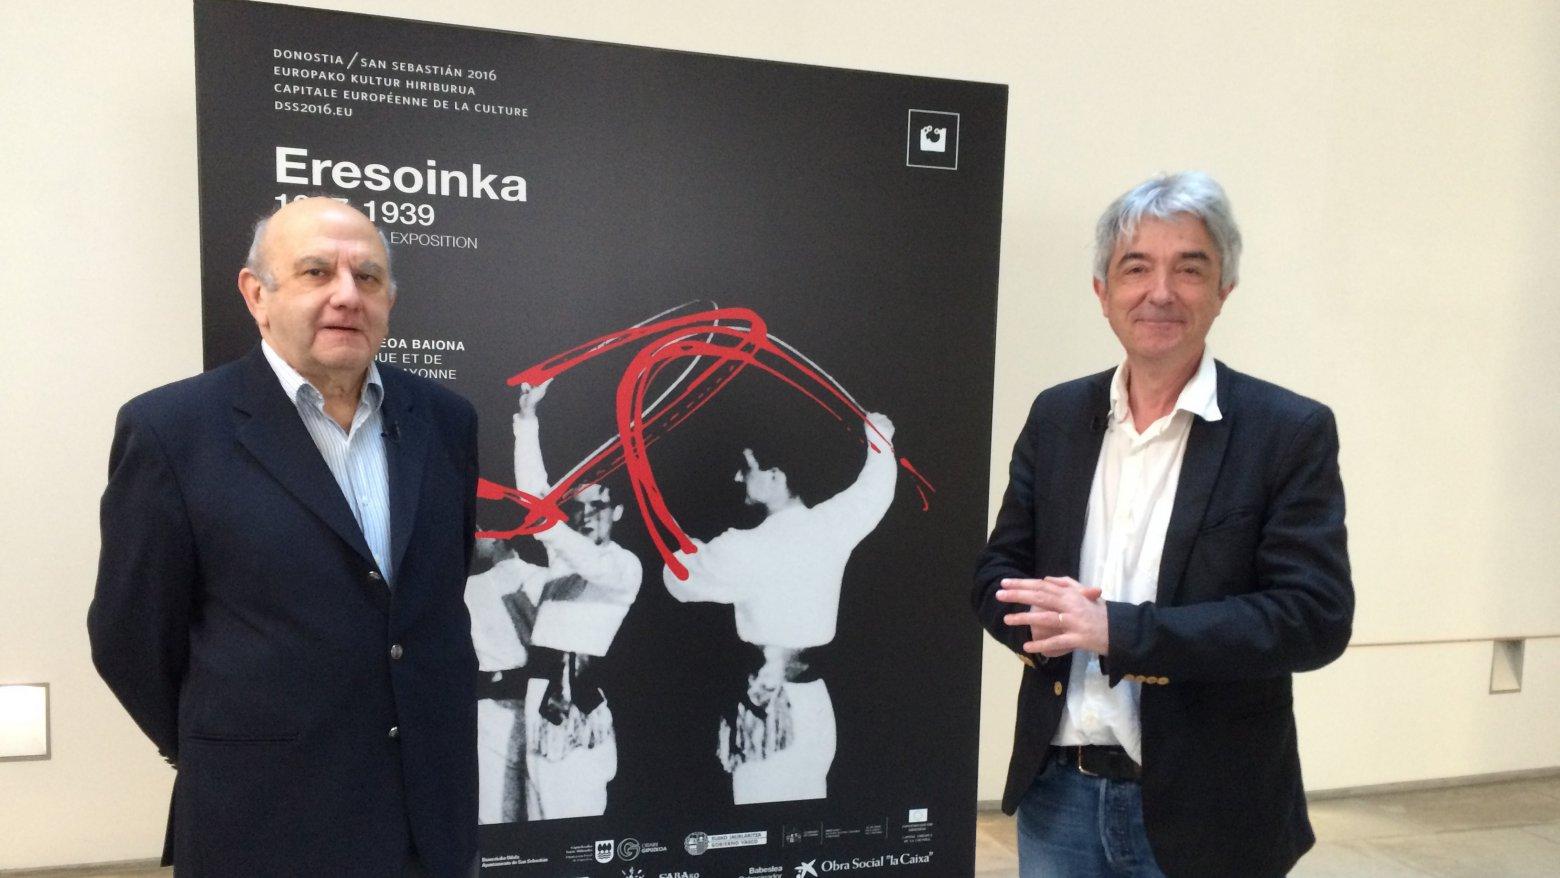 Homage to the Eresoinka group on France 3 TV